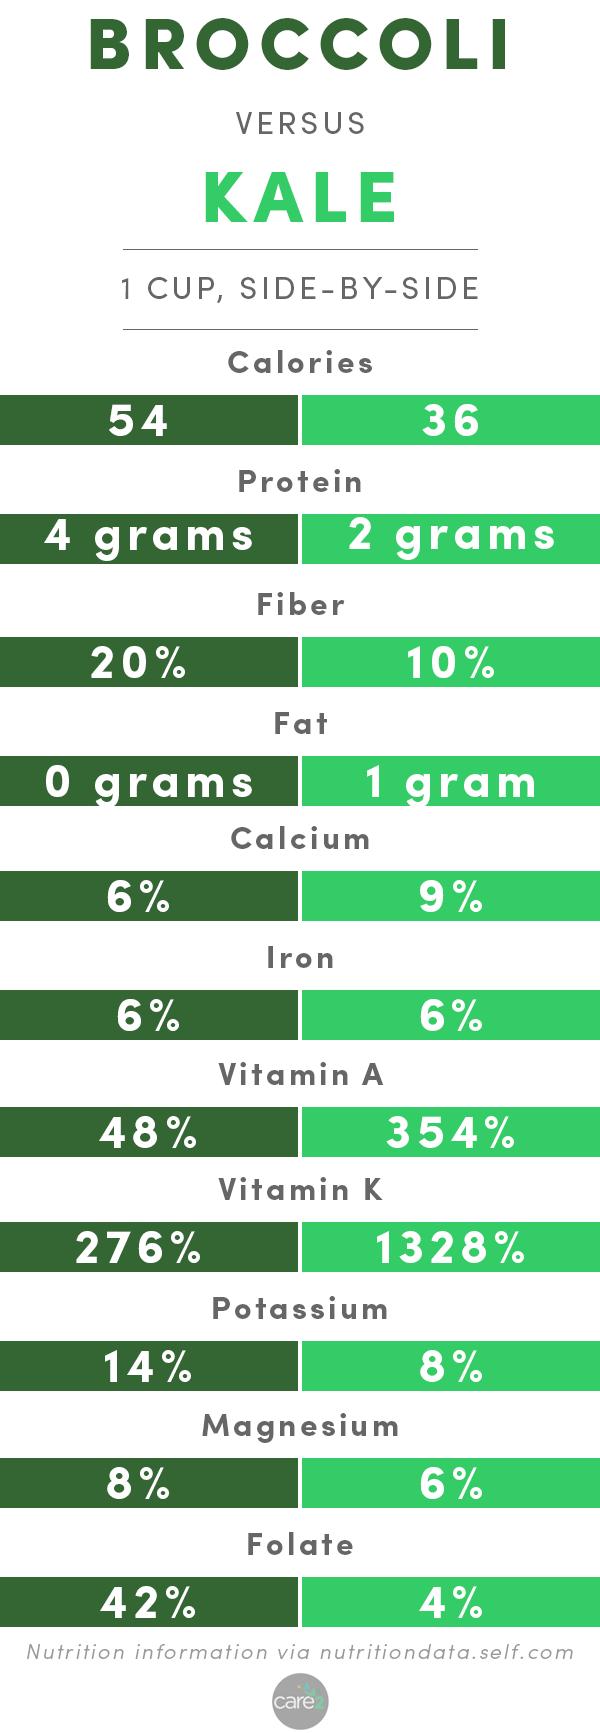 Kale or Broccoli